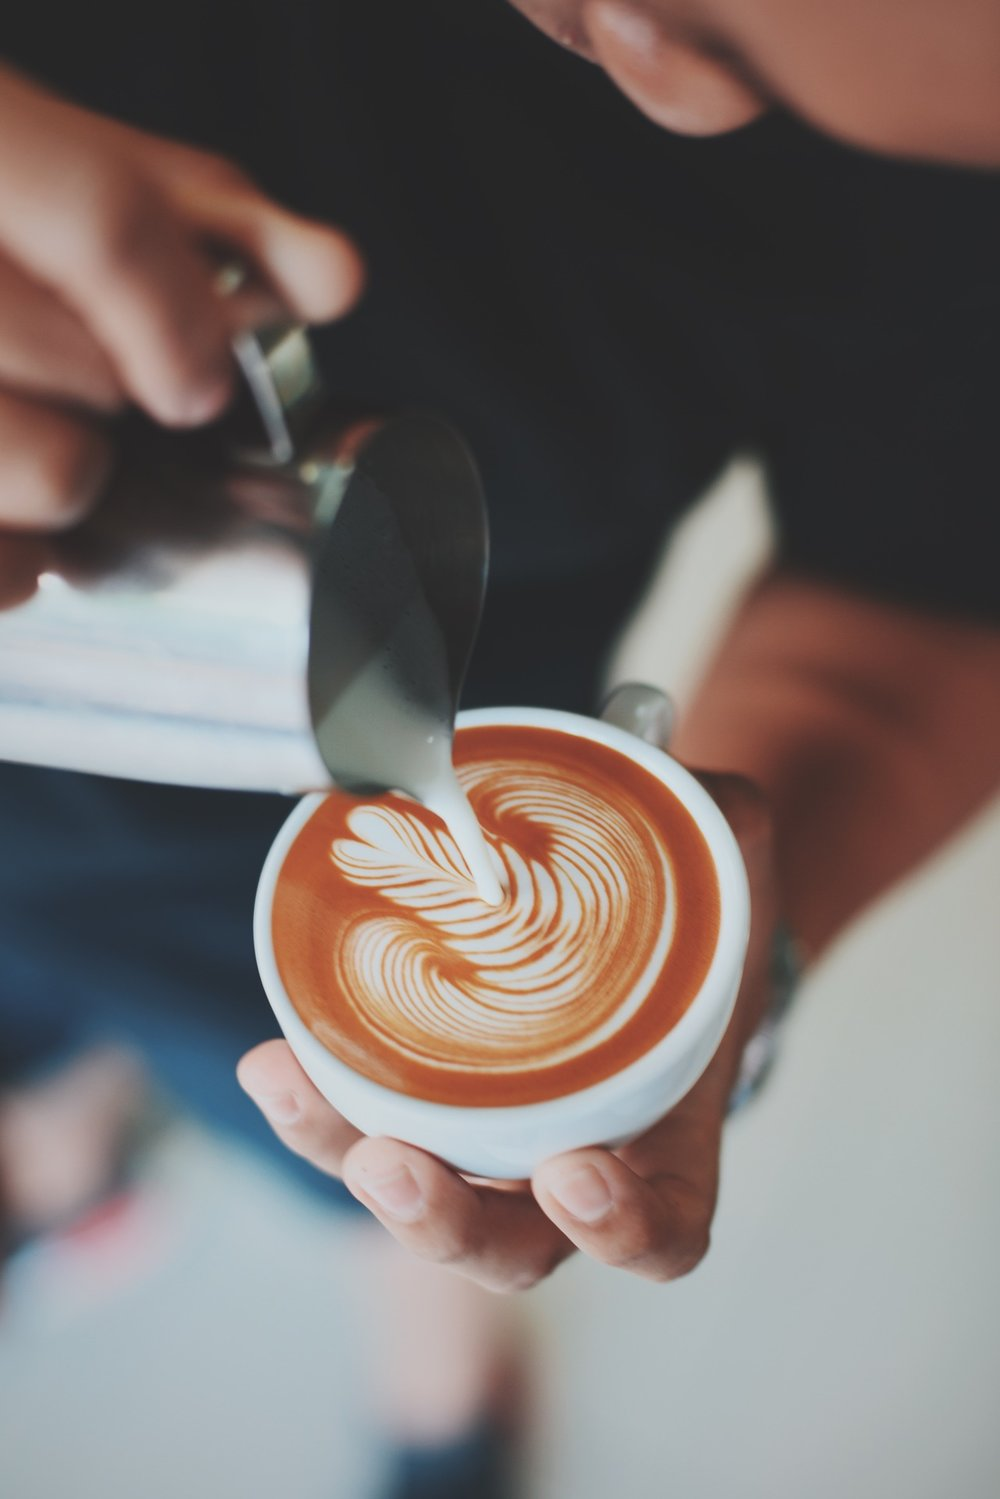 coffee-2589764_1920.jpg